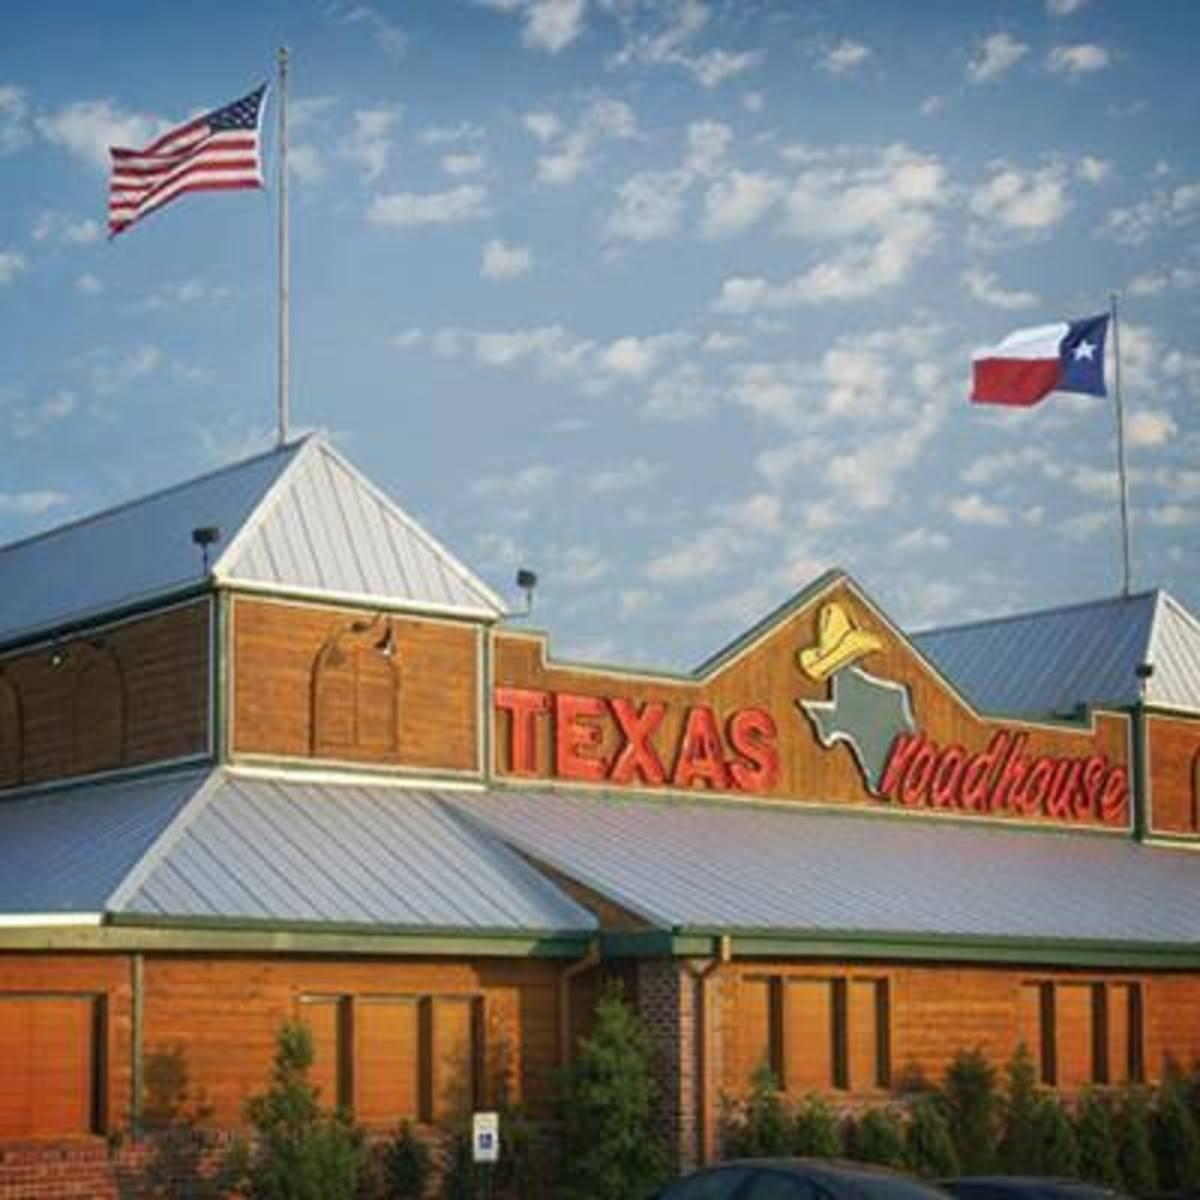 veteran-texas-roadhouse-3